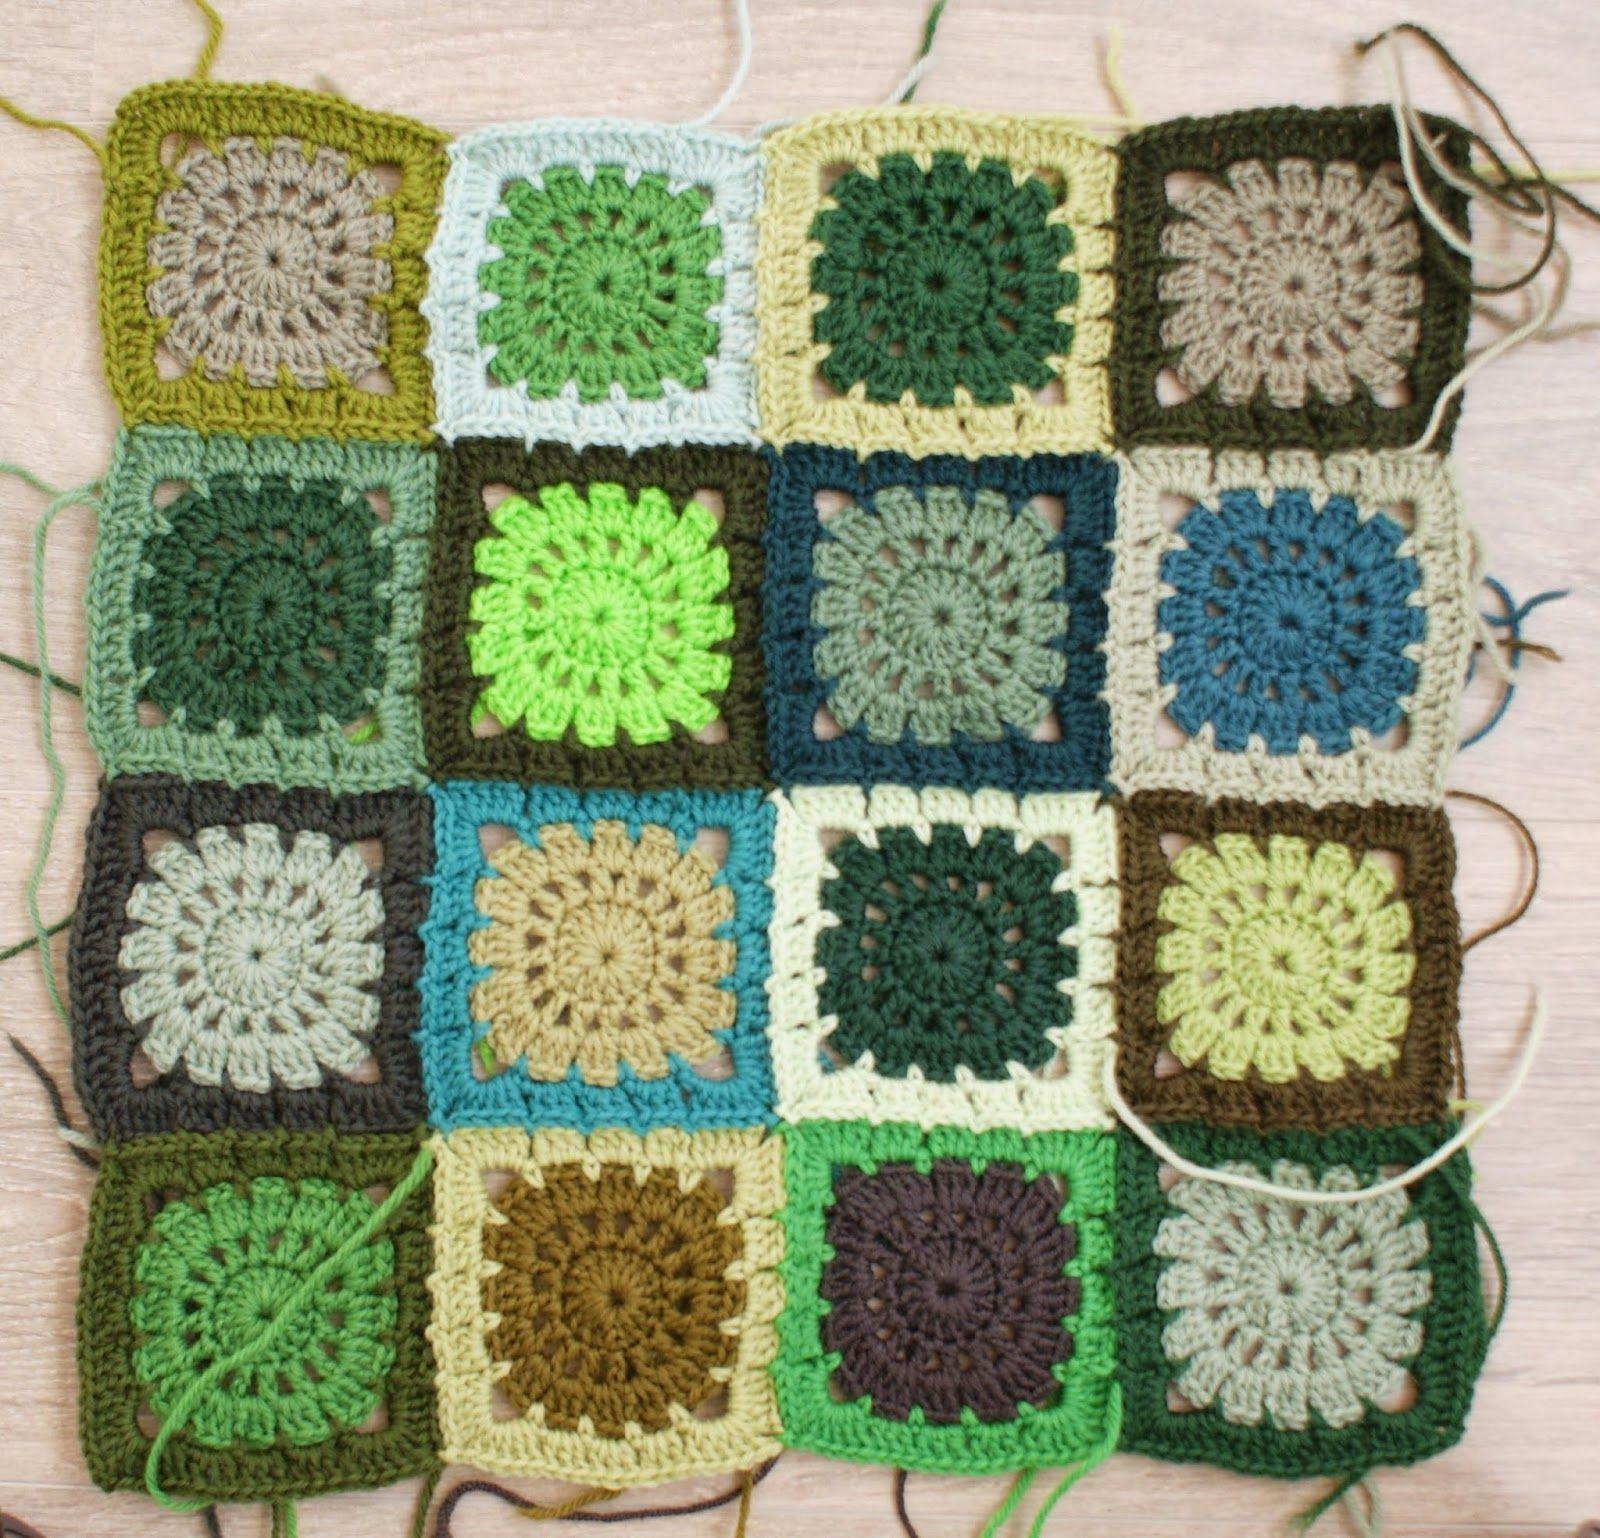 dutch sisters: Crochet Retro Block Pattern | Crochet afghans ...